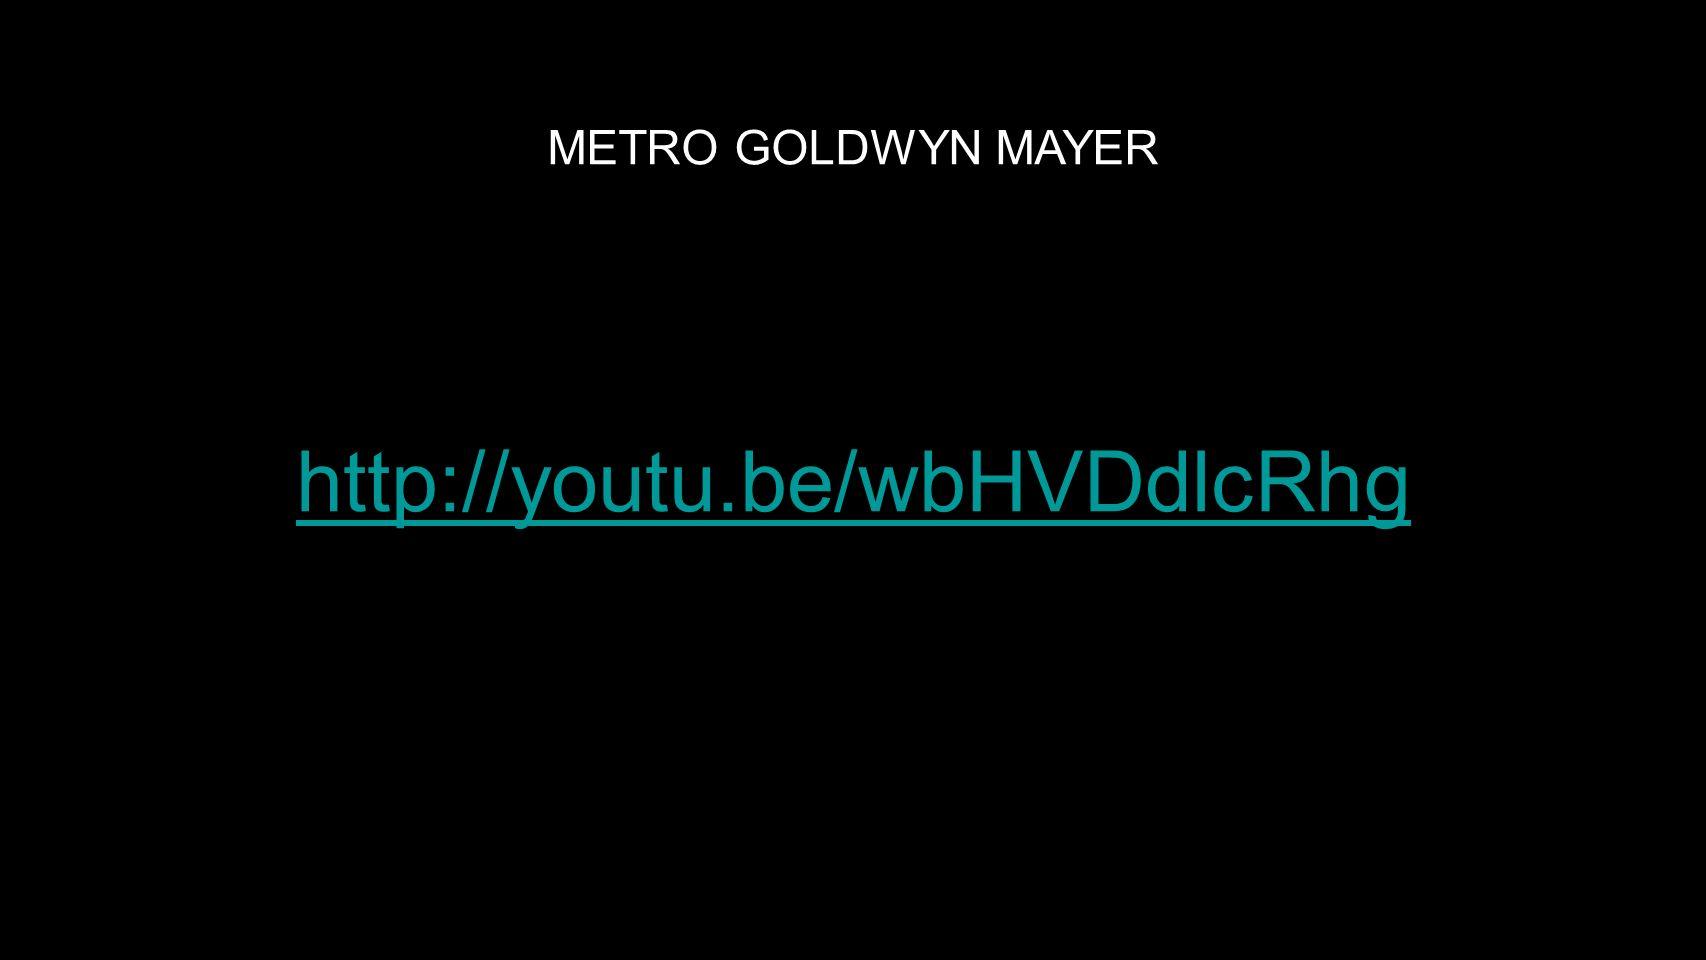 METRO GOLDWYN MAYER http://youtu.be/wbHVDdlcRhg